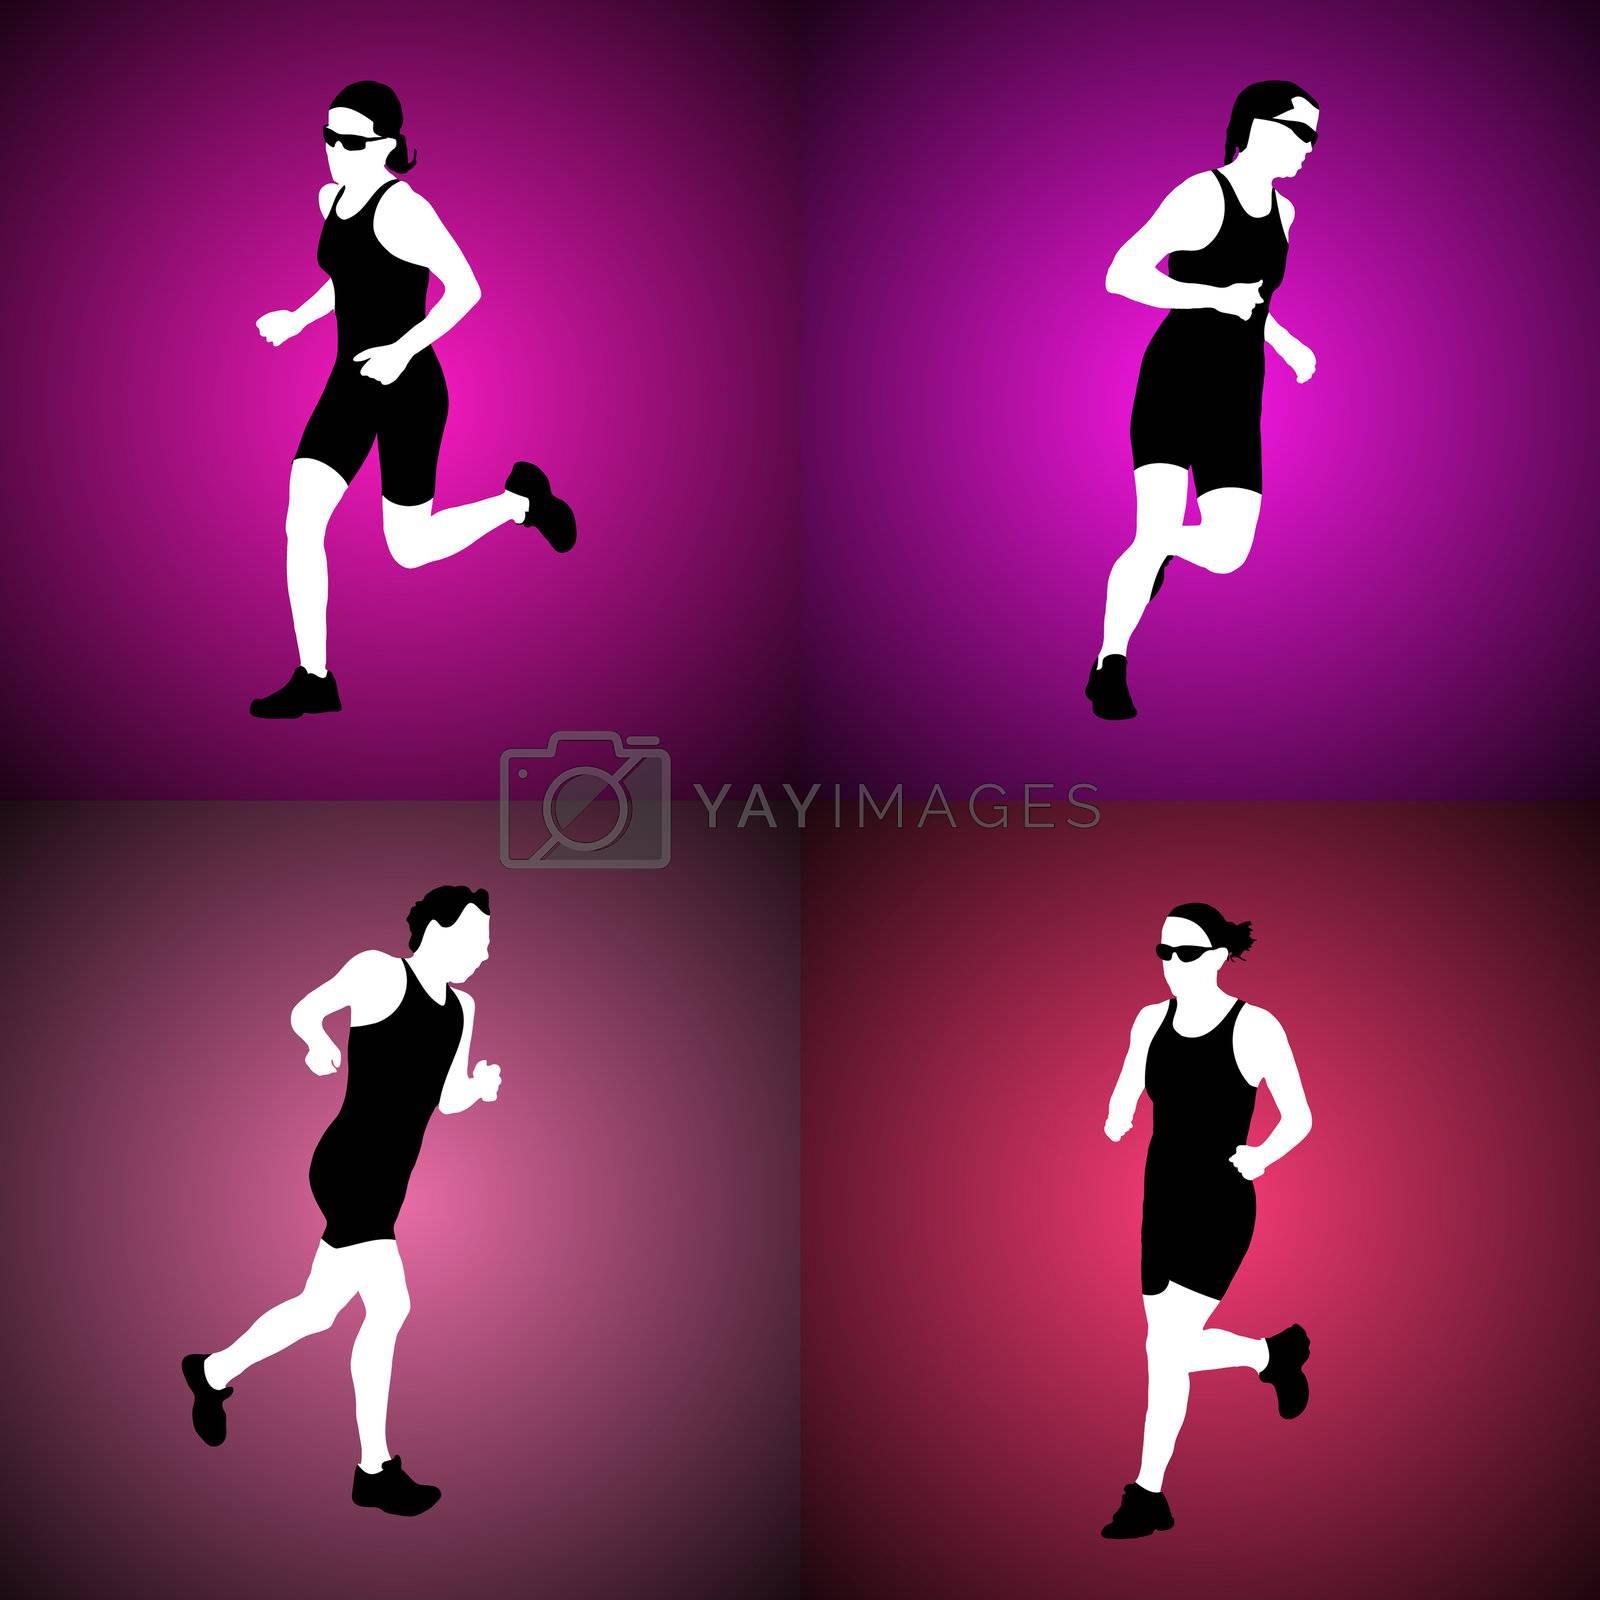 Royalty free image of Running women by homydesign